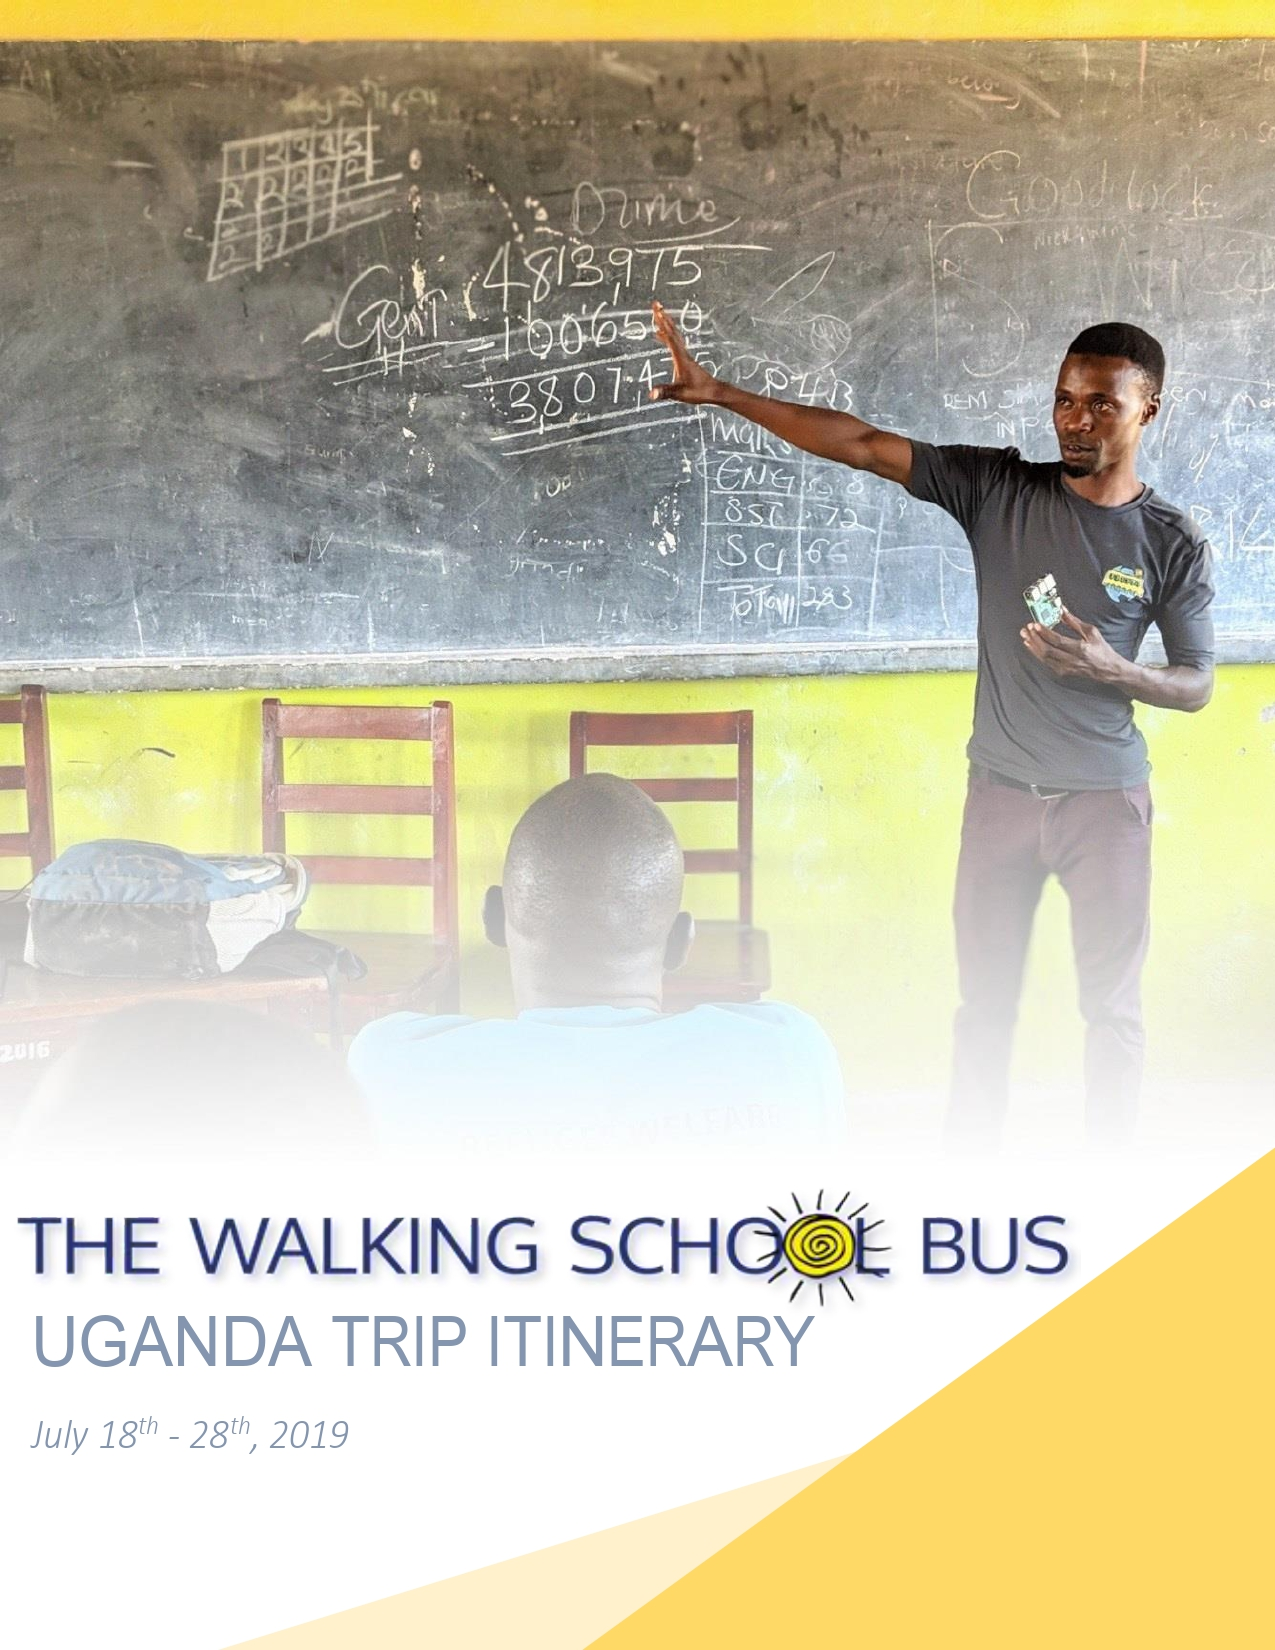 TWSB Uganda Expedition: July 2019 — The Walking School Bus